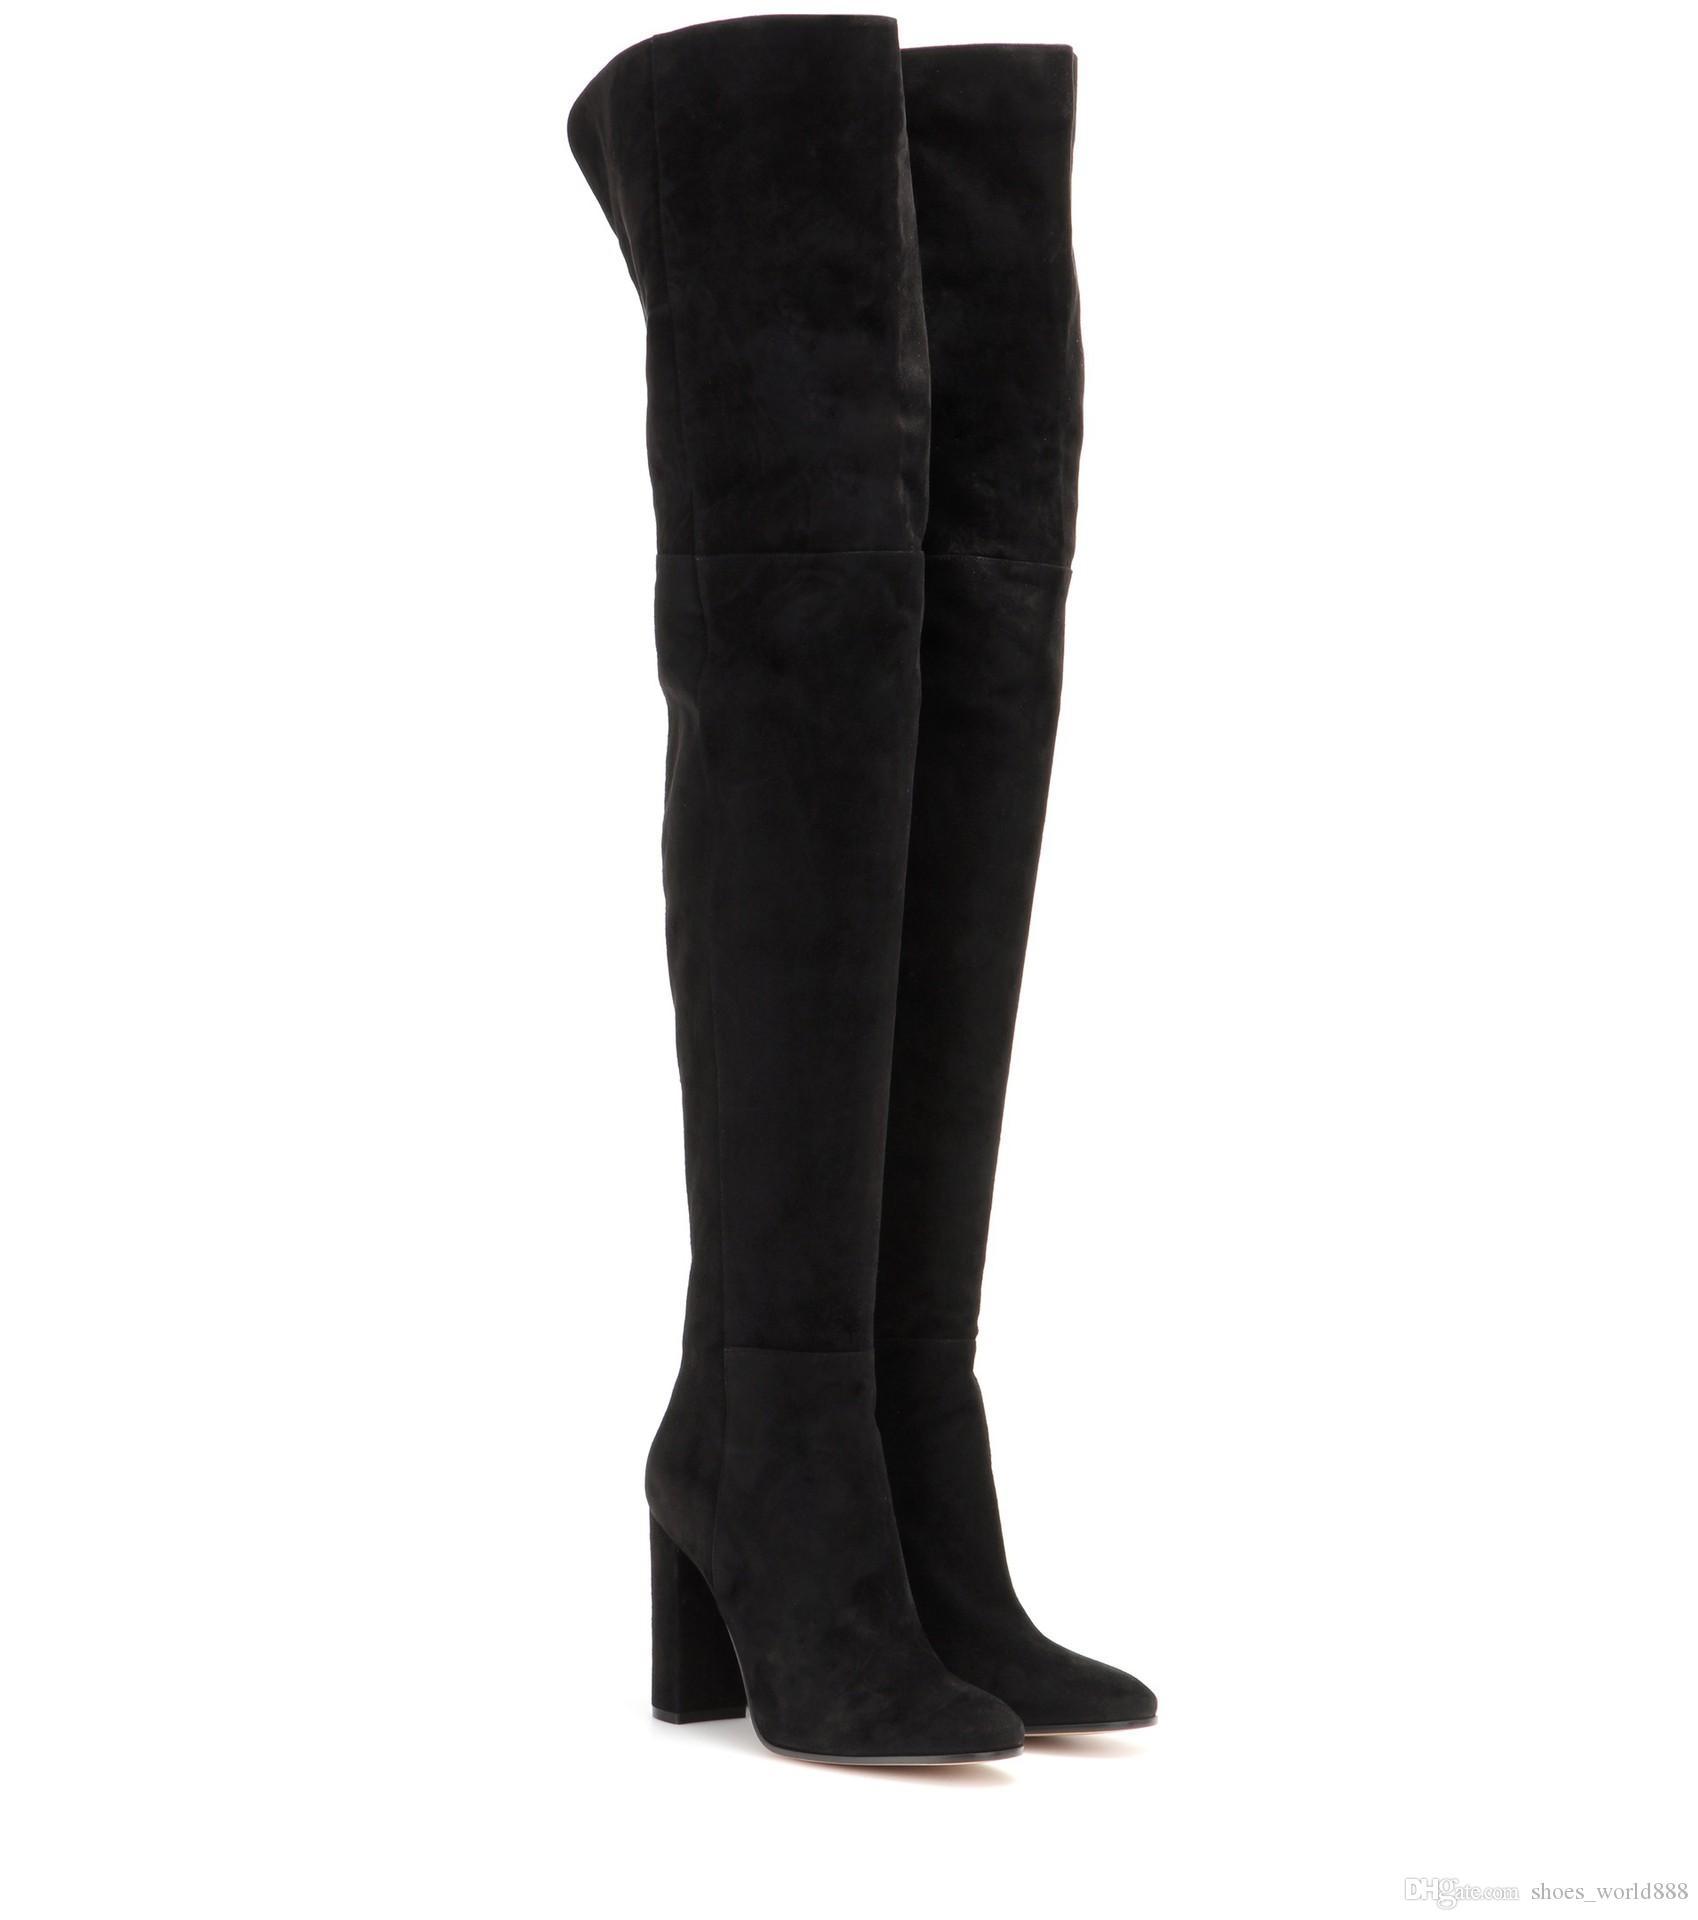 Compre botas para mujer de diseñador botas de terciopelo negro jpg  1698x1920 Botas para dama 0458a412ed2c6